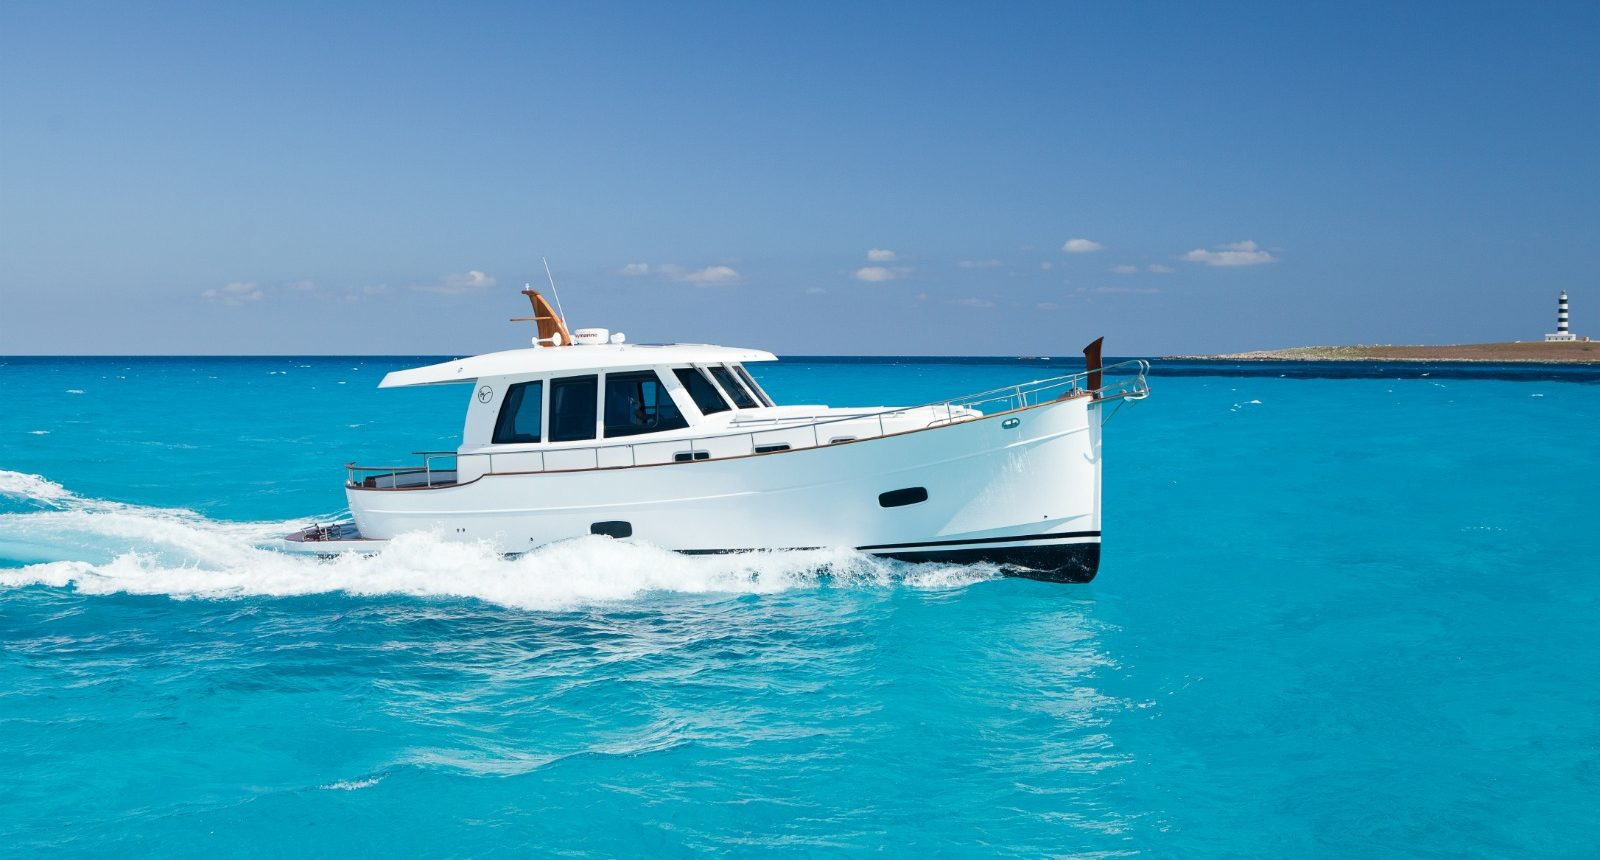 Minorca Islander 42 for sale - Running